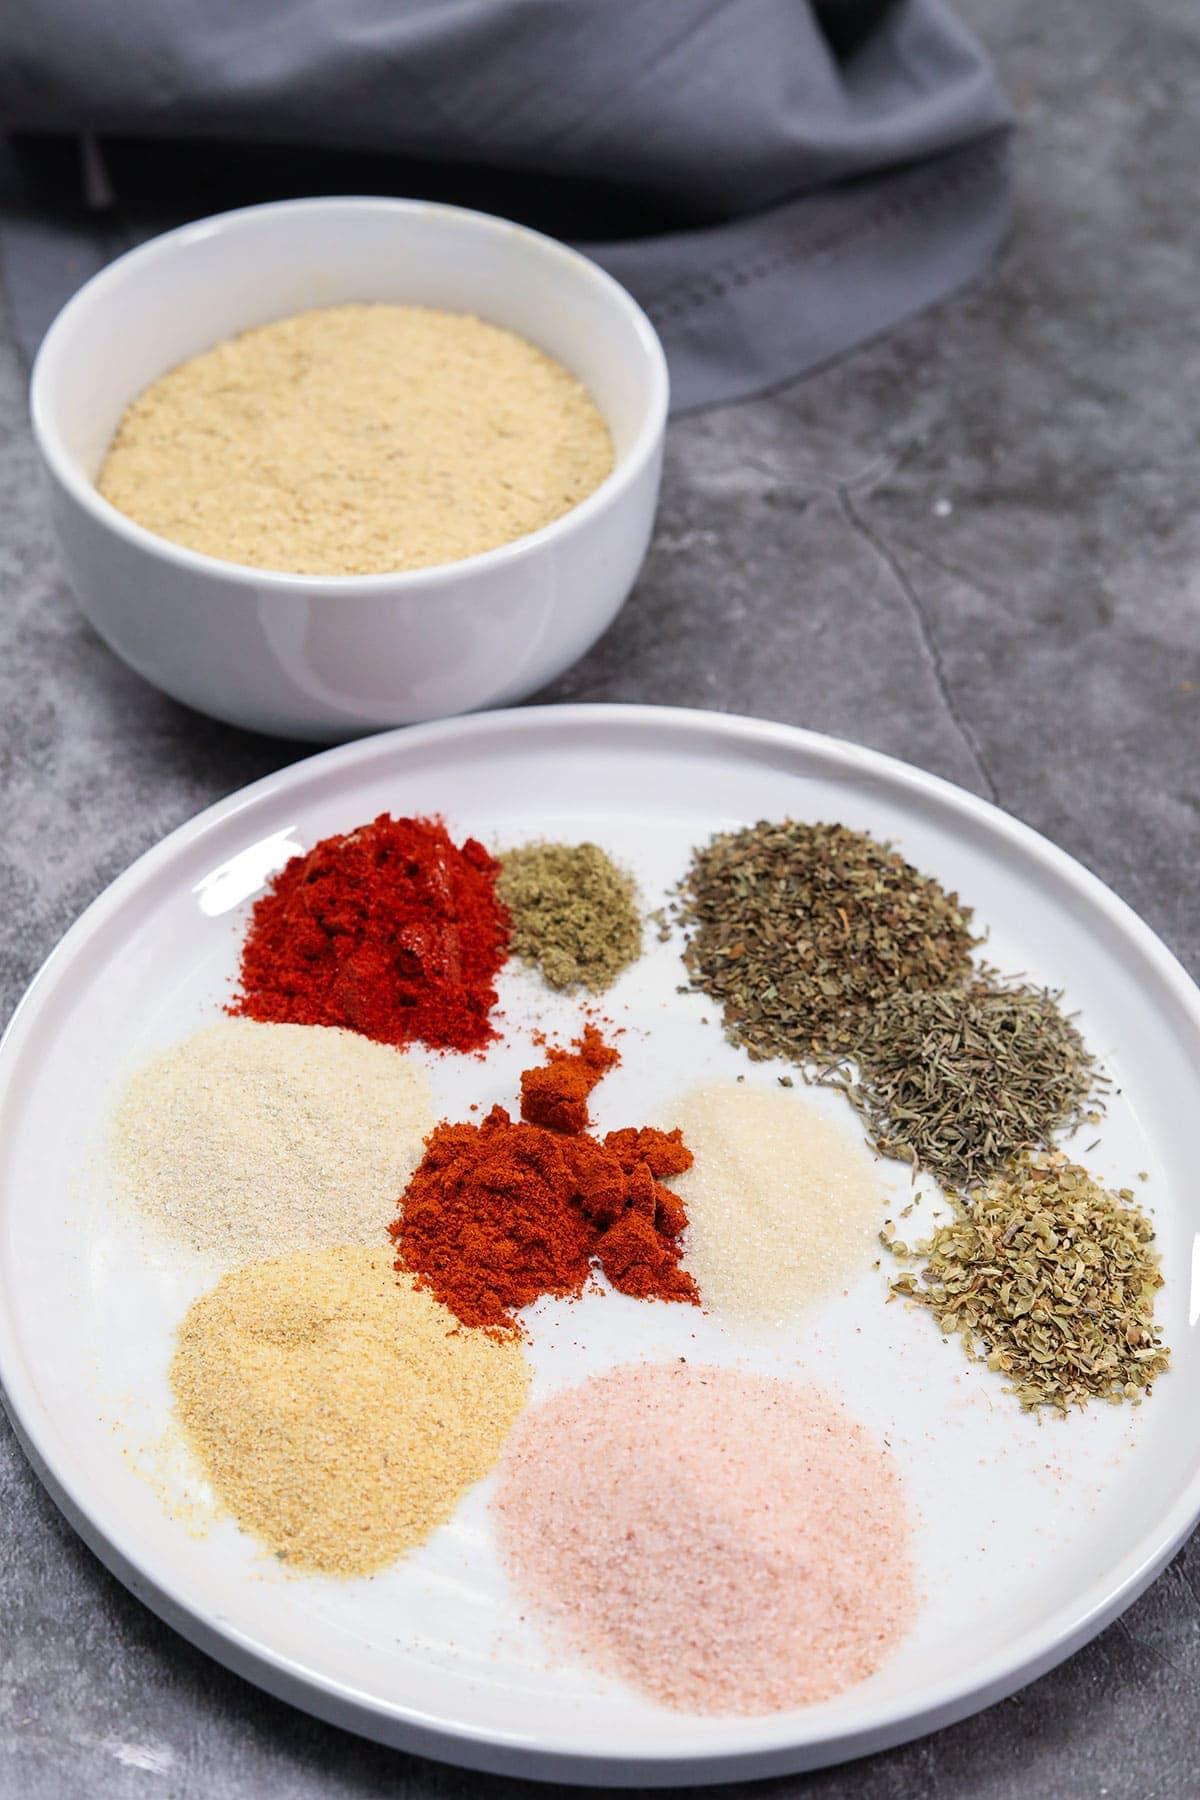 Ingredients for chicken style seasoning